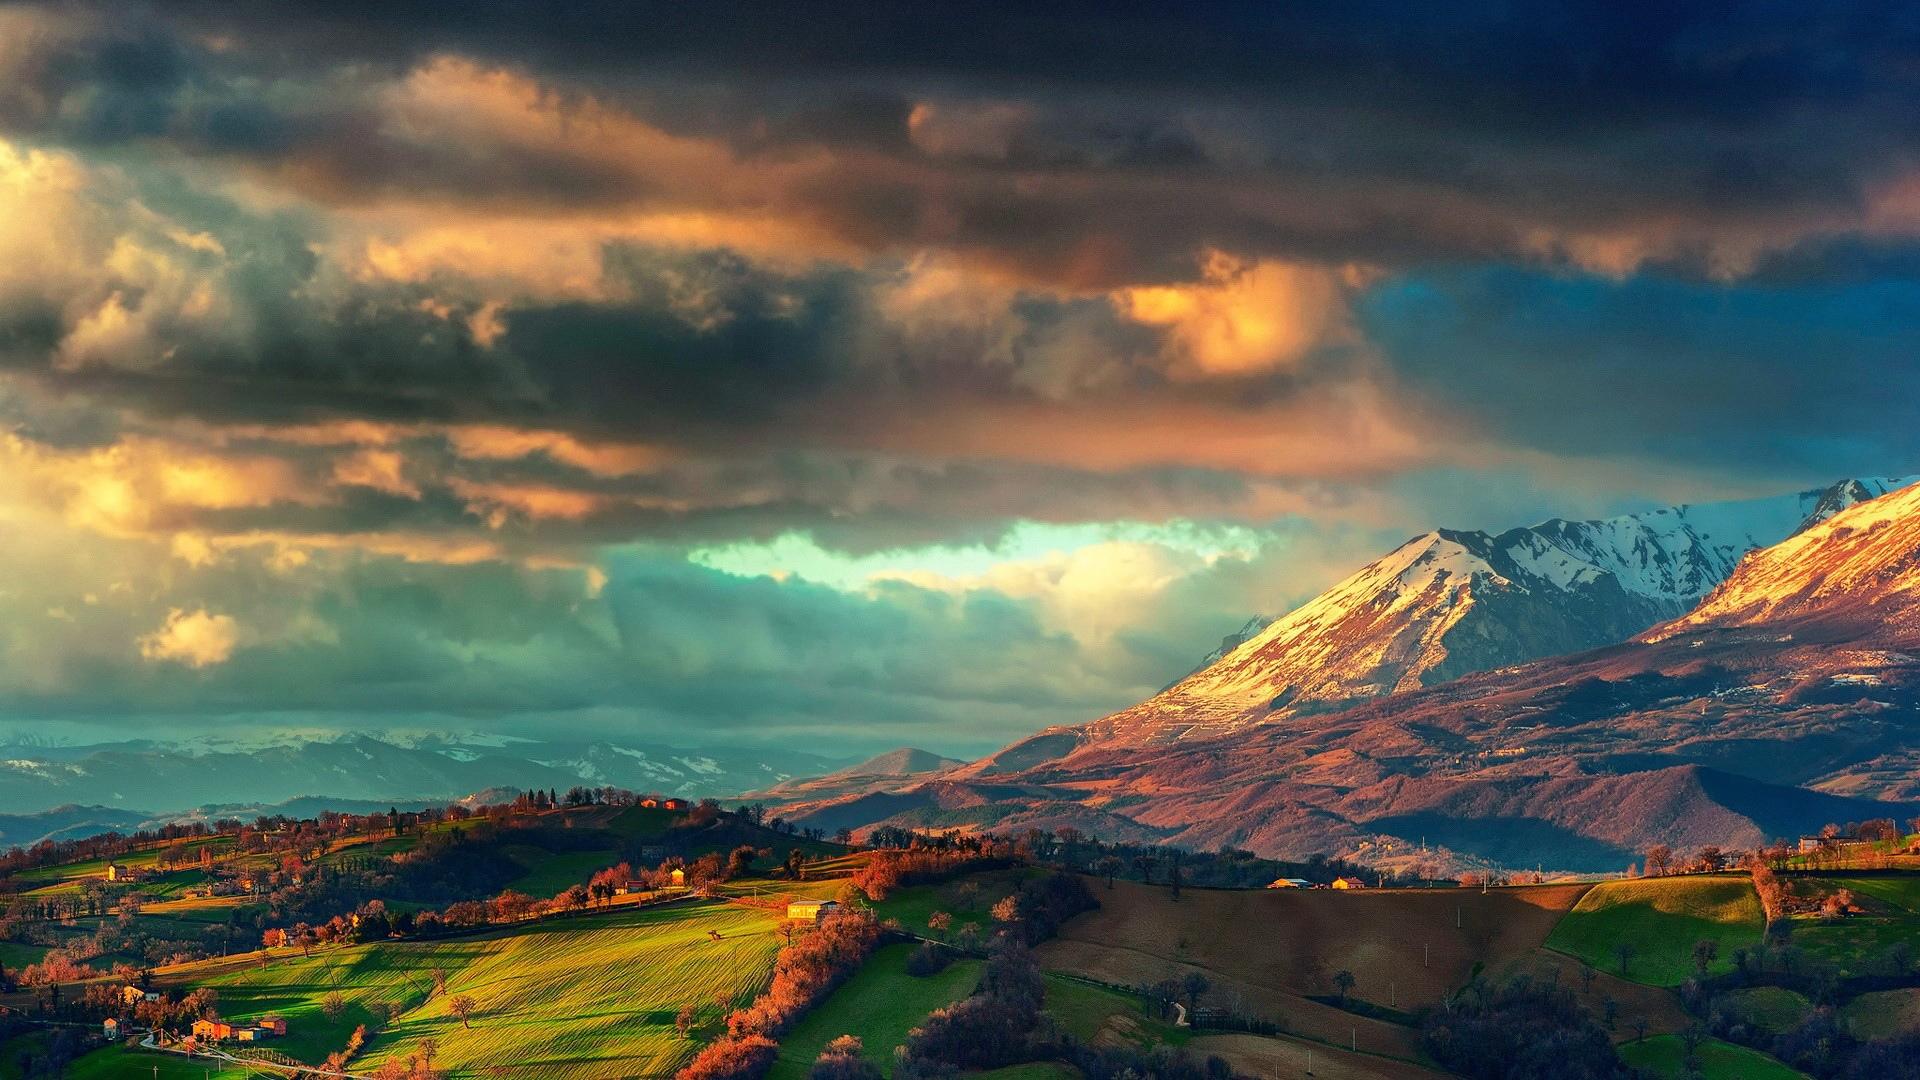 Fantastic Mountain Village Wallpaper 38566 1920x1080 px